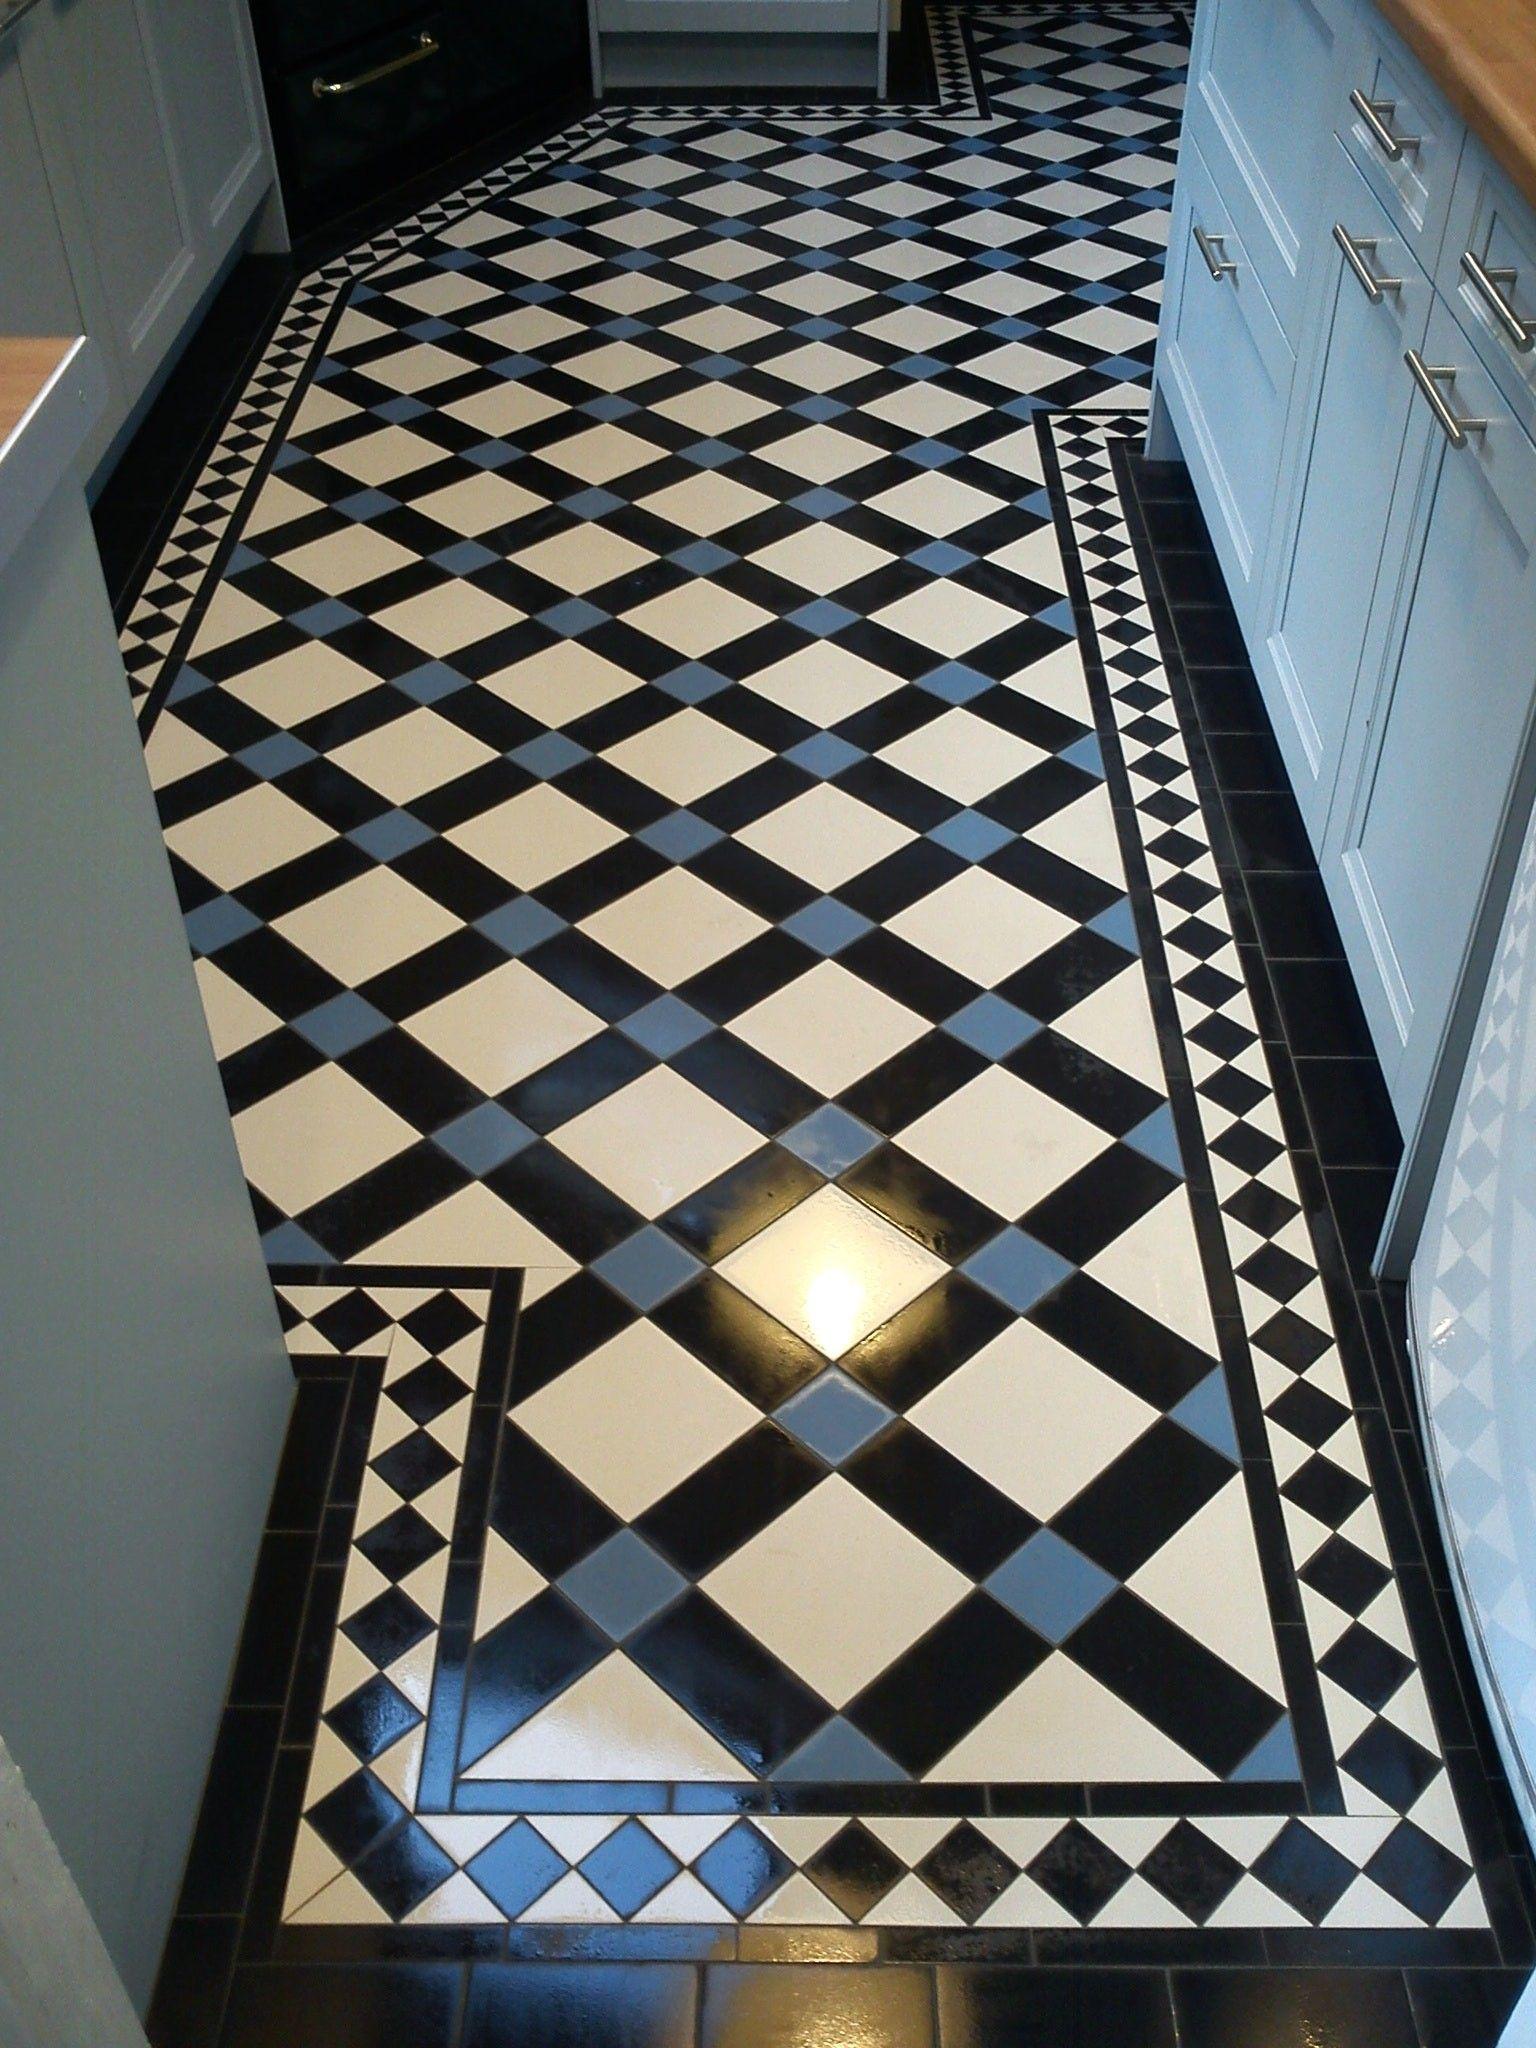 Victorian Hall Tiles Floor Best Of Living Room Tile Flooring Ideas For Hallways Mosaic Floor Tiles Mosaic Flooring Kitchen Flooring Floor Tile Design